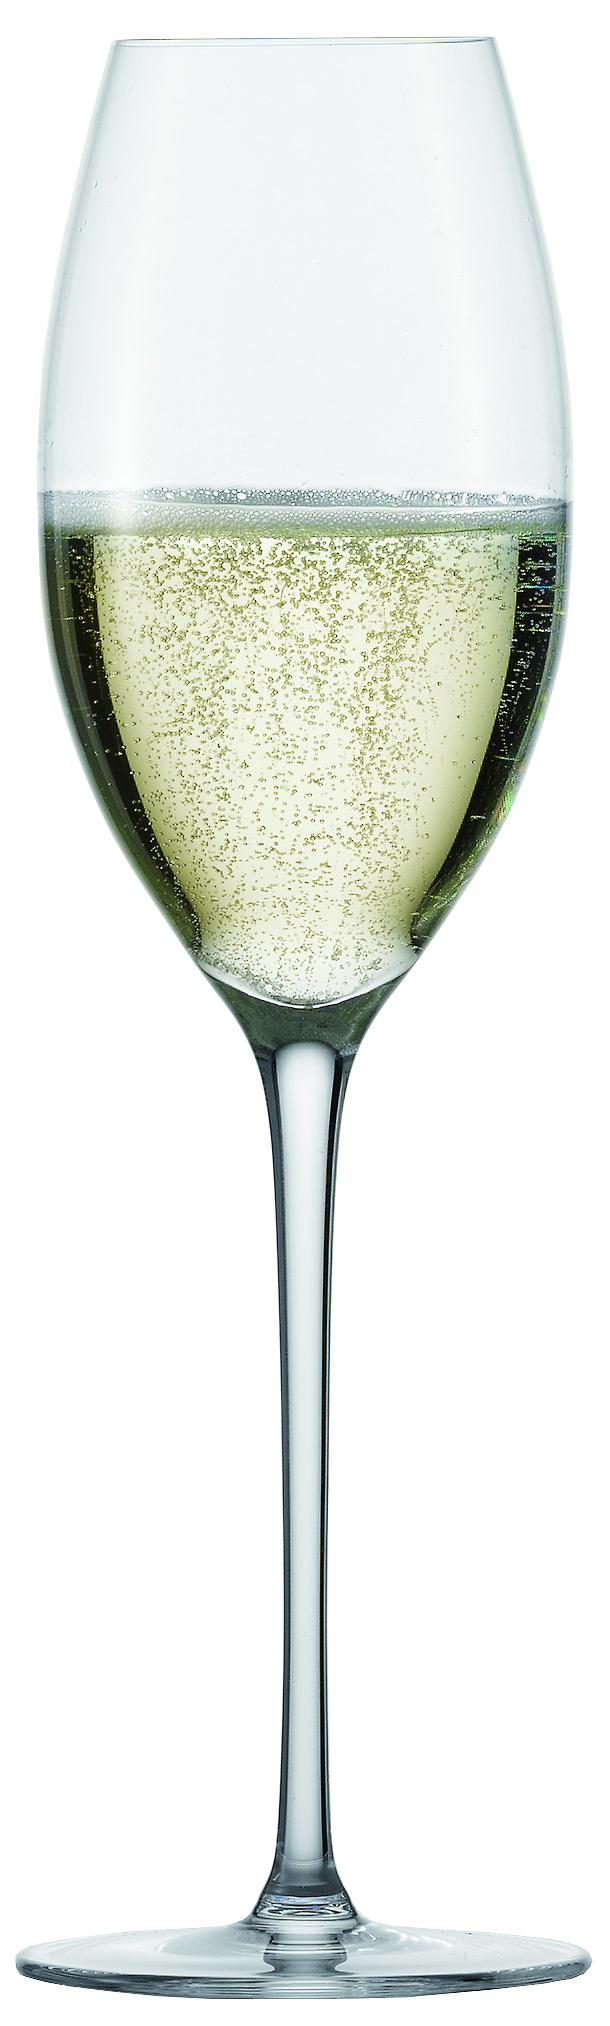 Champagne - Enoteca